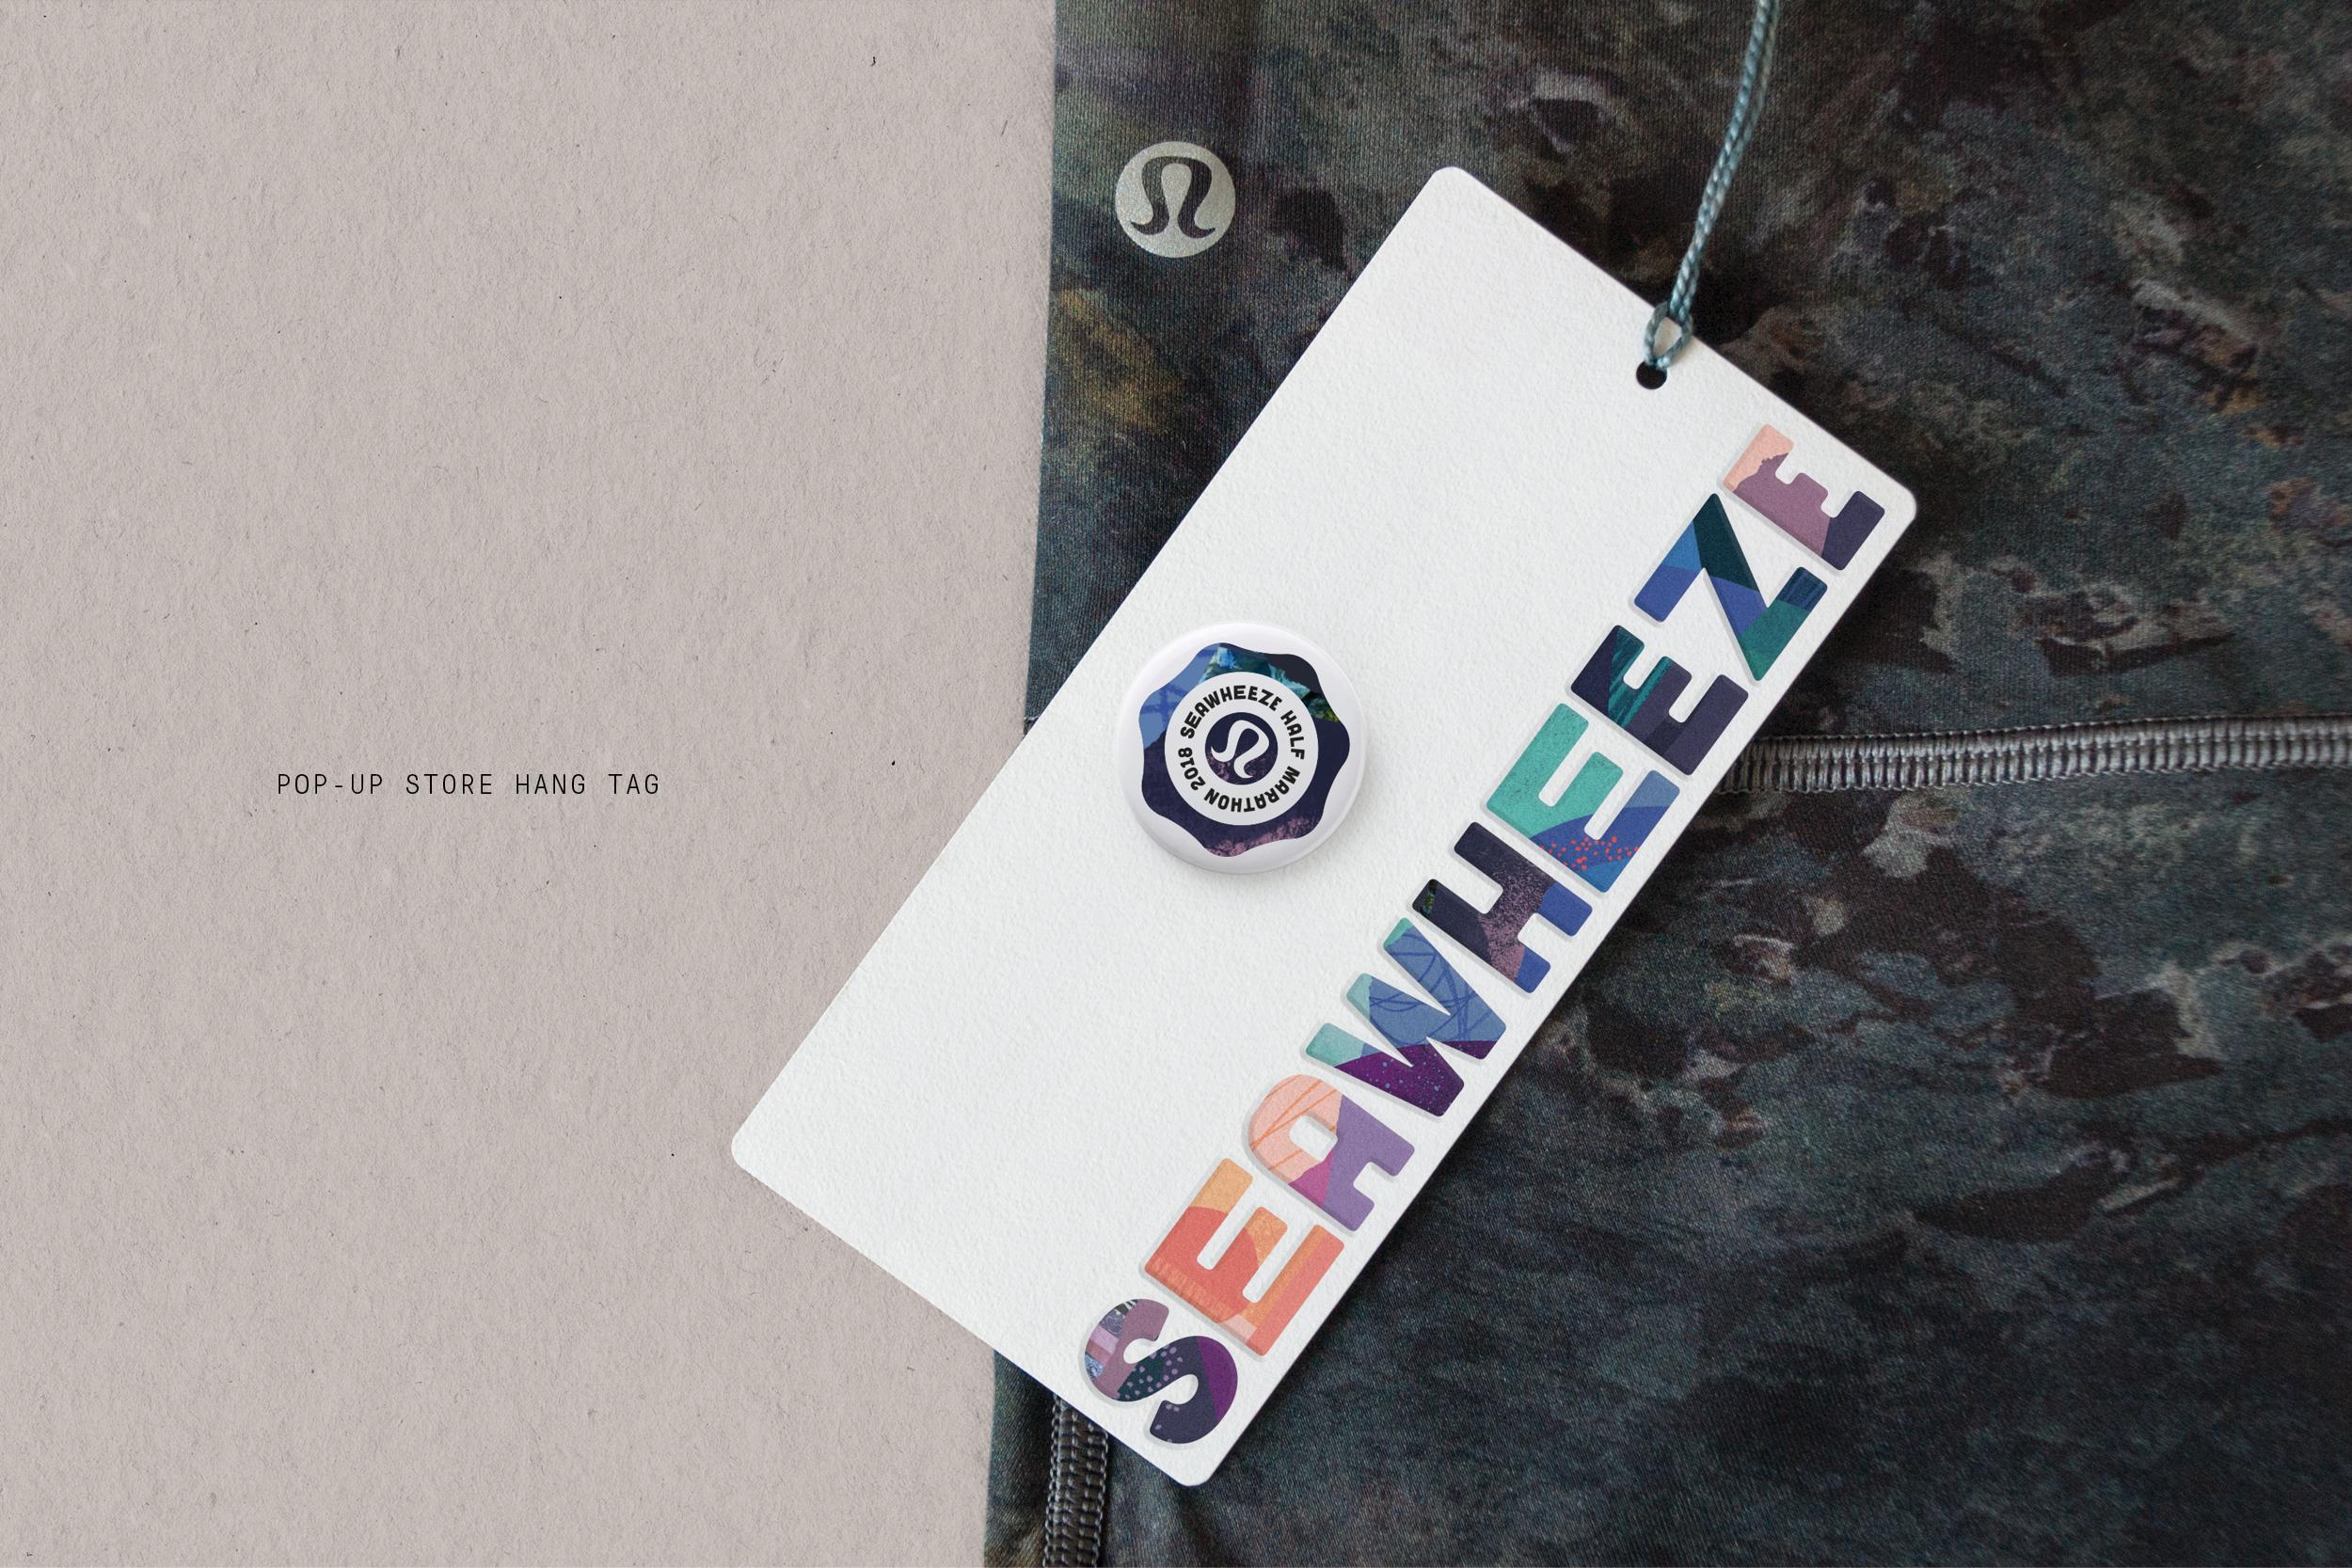 Lululemon SeaWheeze 2018 Half Marathon Branding: hang tag design with fun colourful pattern illustration and type treatment.